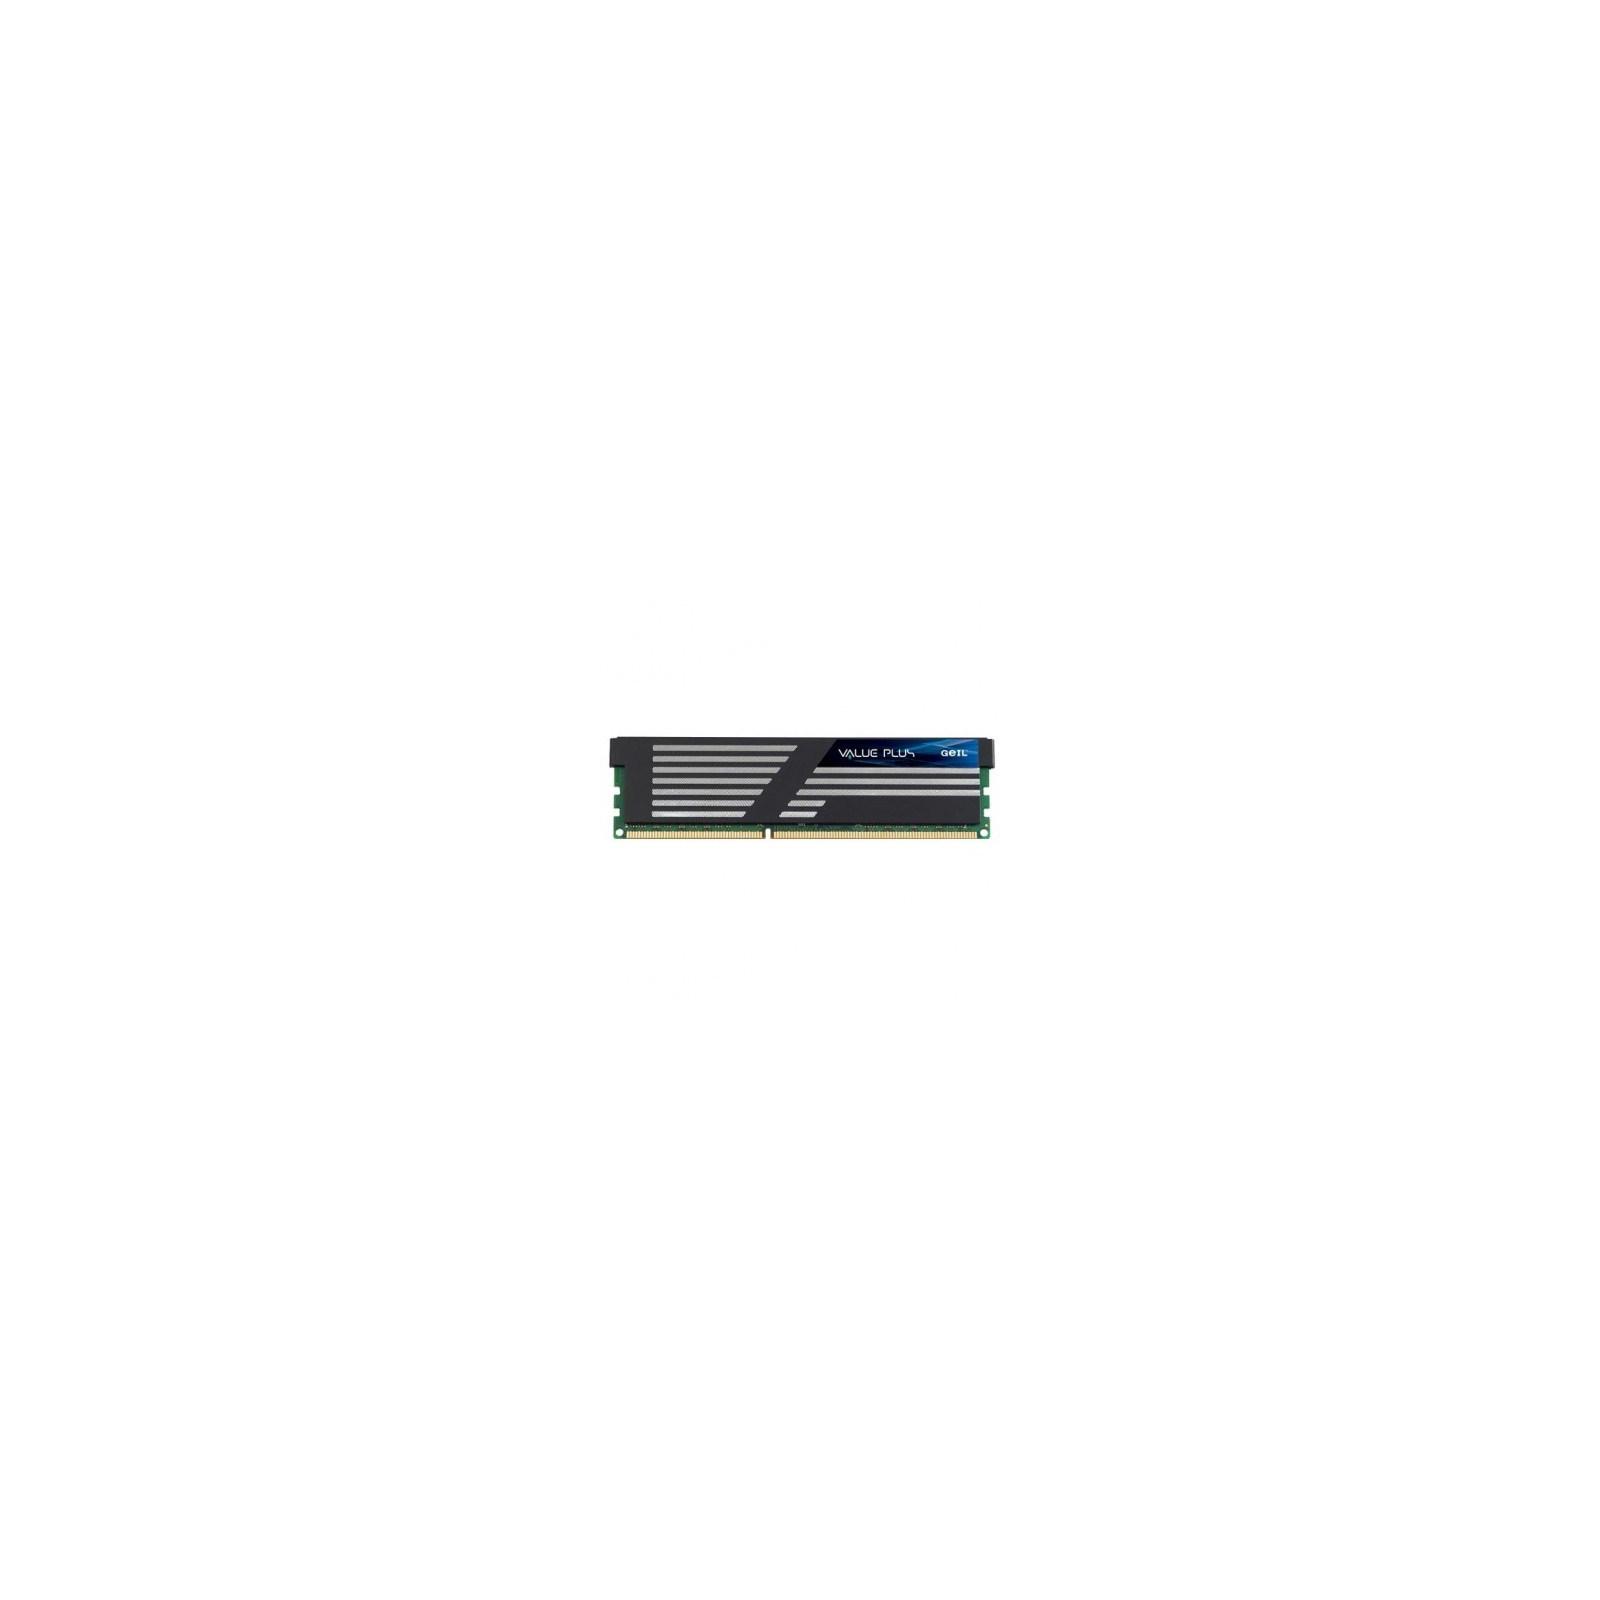 Модуль памяти для компьютера DDR3 8GB 1333 MHz GEIL (GVP38GB1333C9SC)